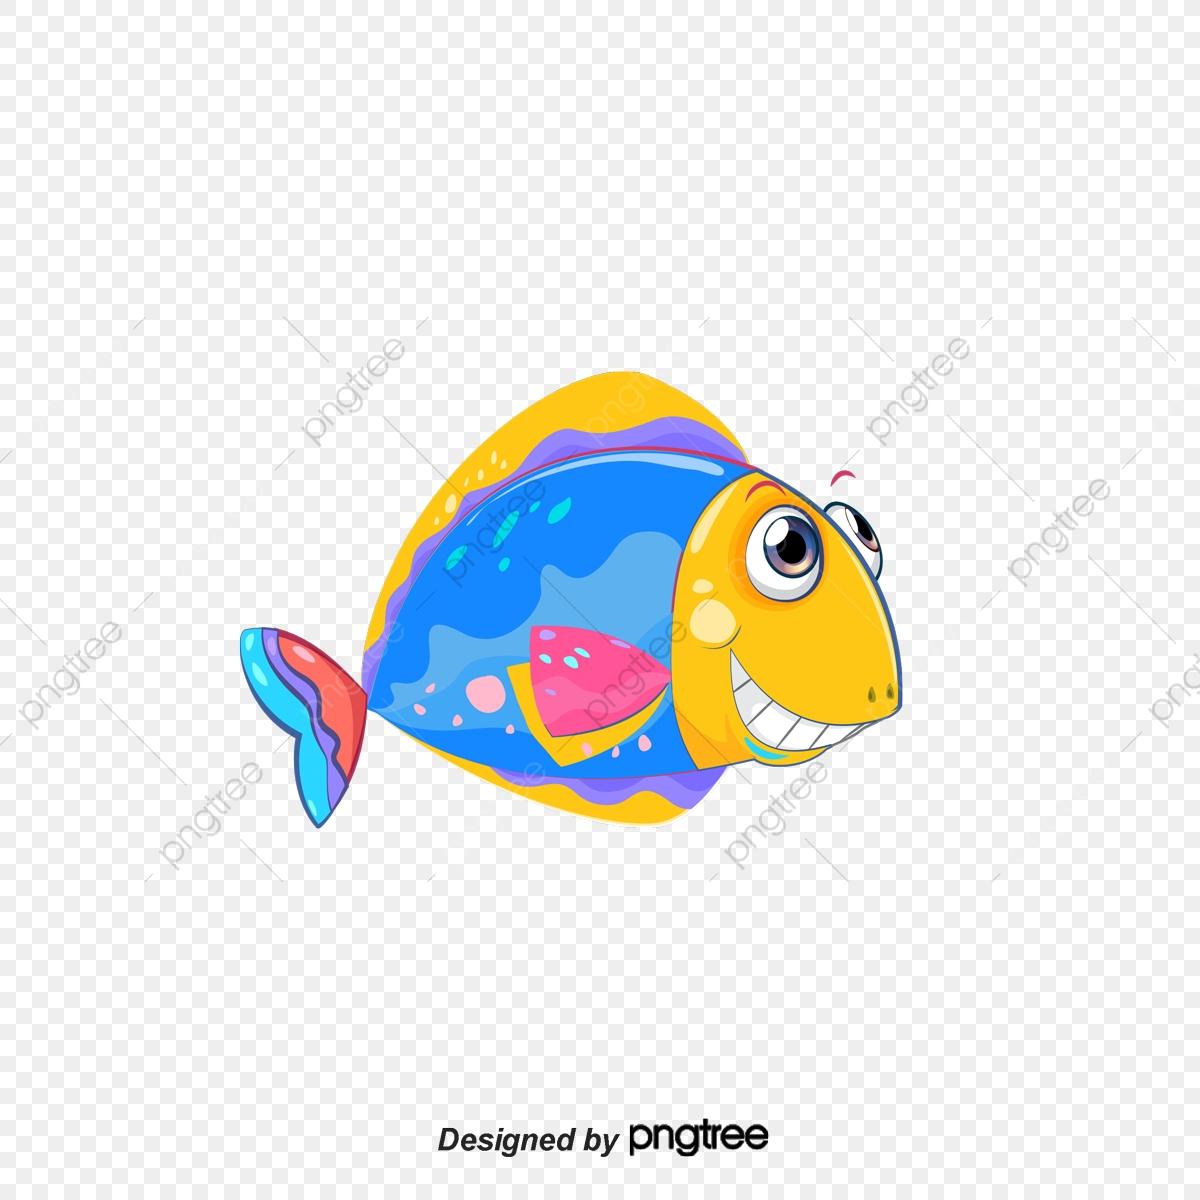 Fish small ocean lantern. Squid clipart deep sea creature